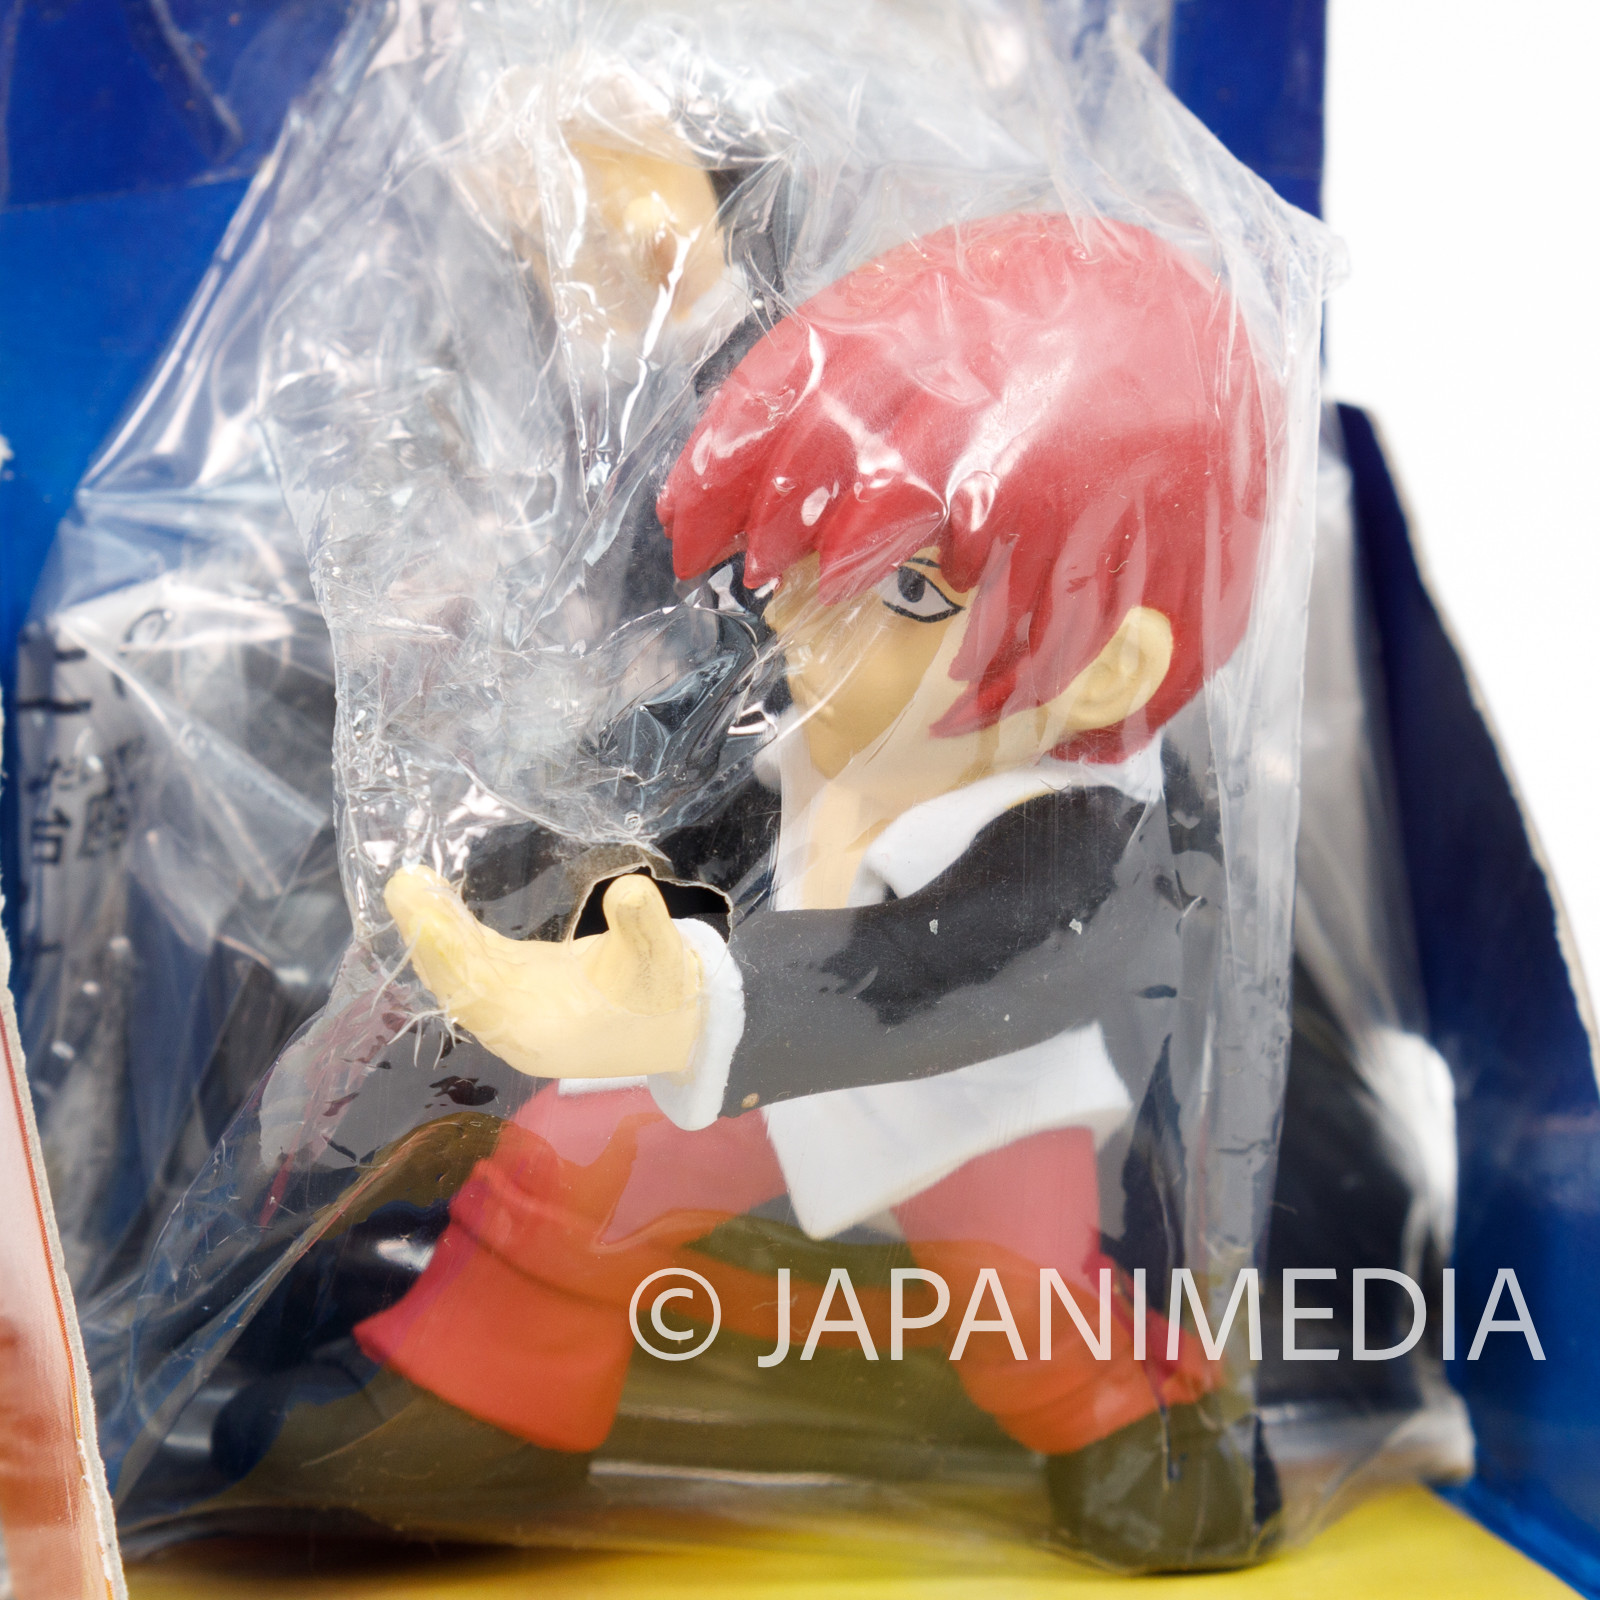 The King of Fighters Iori Yagami Pocket Figure Capcom vs SNK Banpresto JAPAN GAME